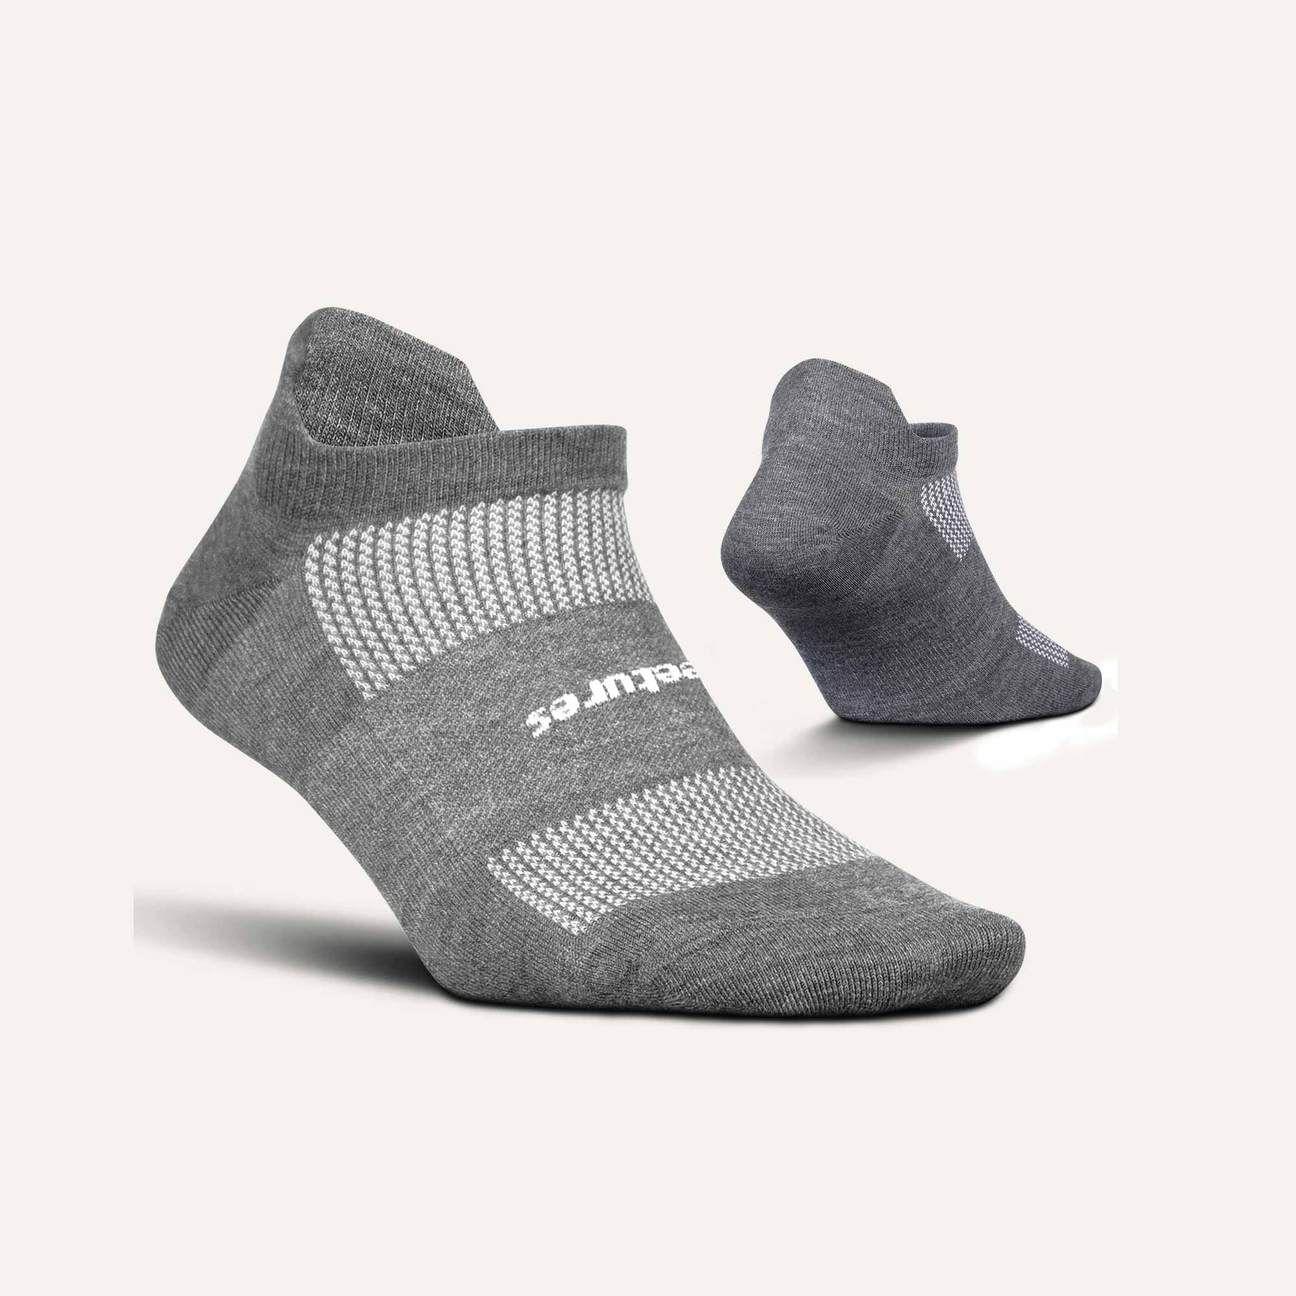 Feetures High Performance Cushion Running Socks